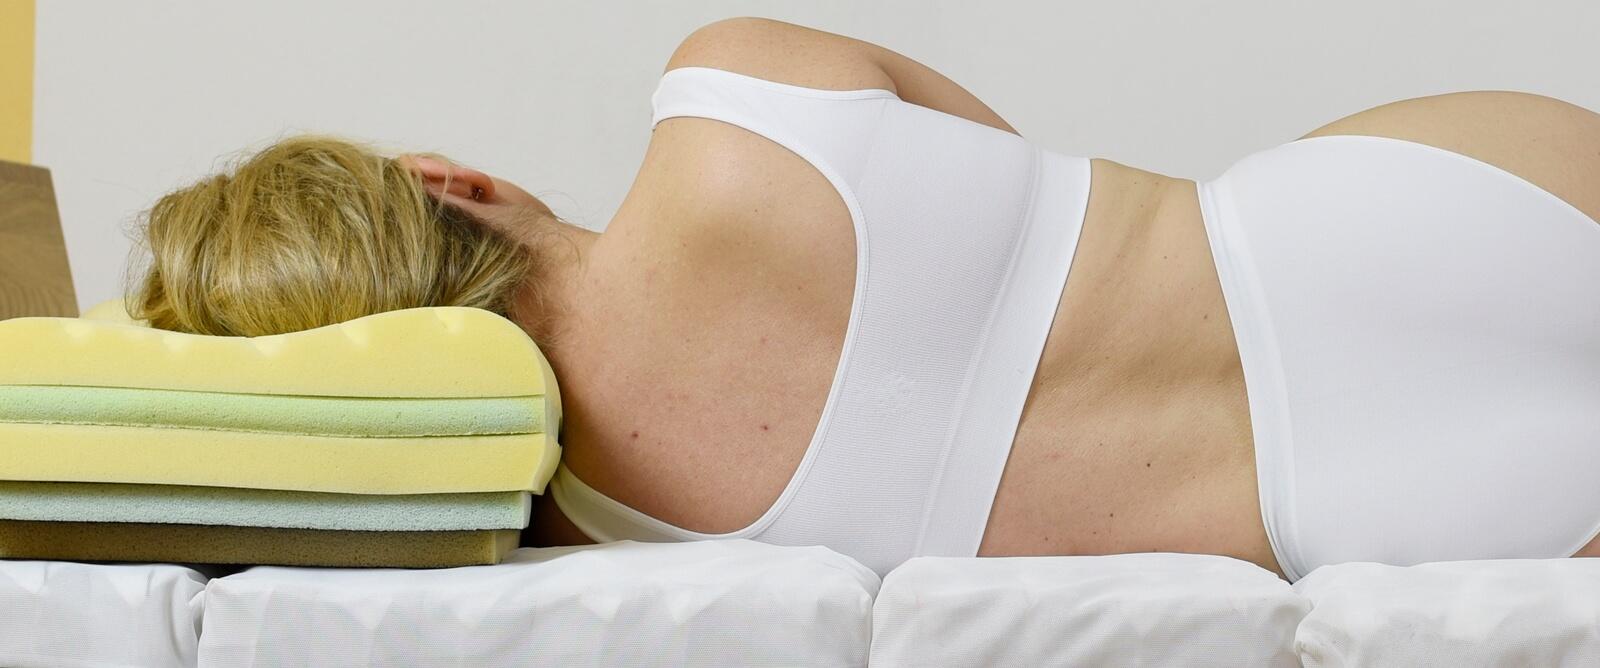 schulterschmerzen durch matratze die l sung matratzengesch ft l beck. Black Bedroom Furniture Sets. Home Design Ideas